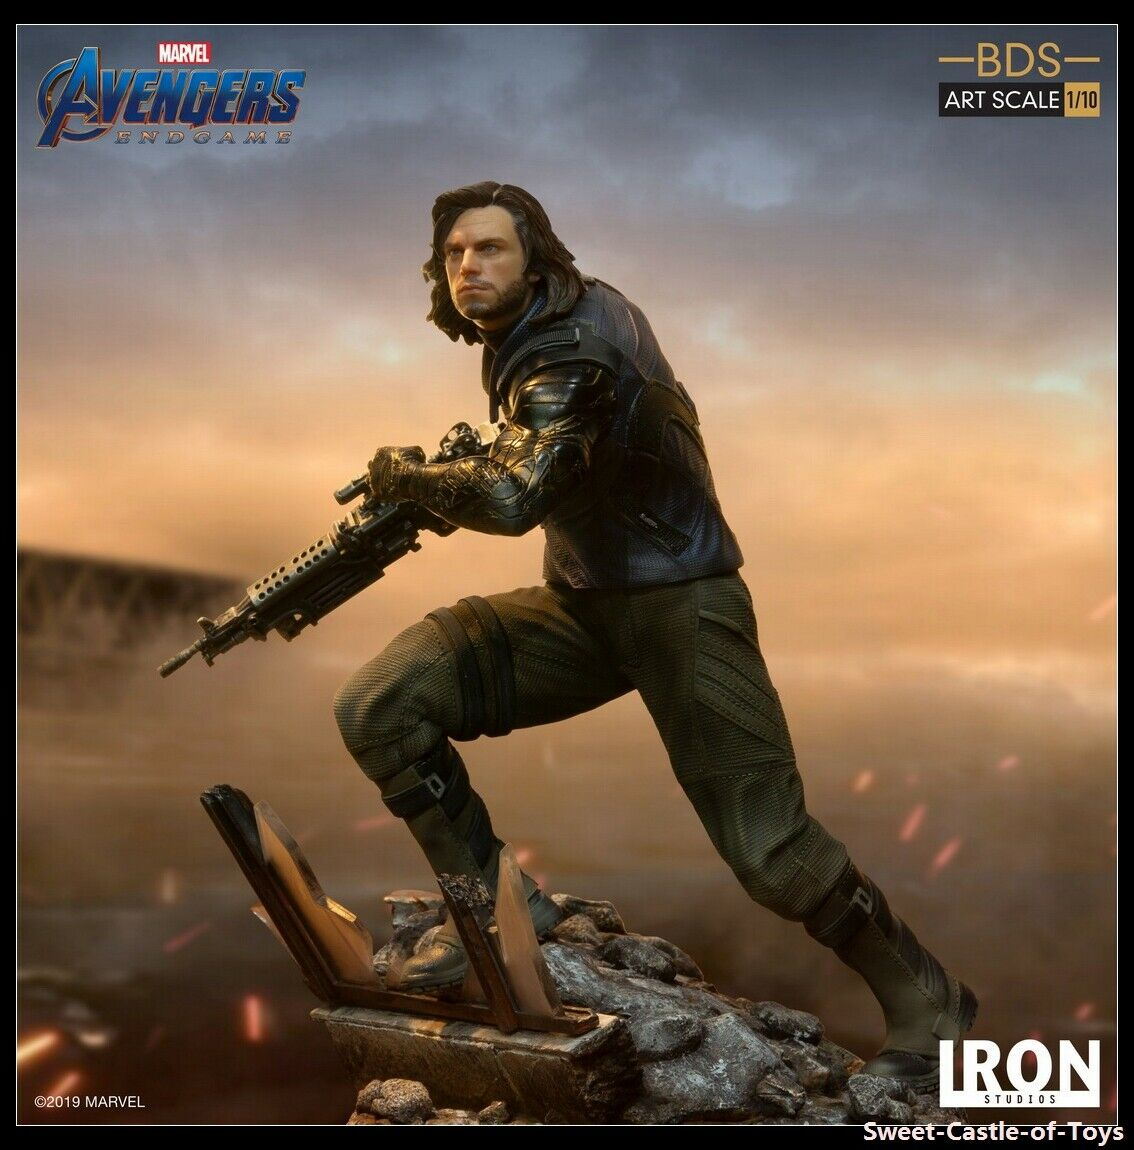 110 Iron Studios Marvel Avengers 4 mosse finali SOLDATO D'INVERNO BDS ART SCALA Statua